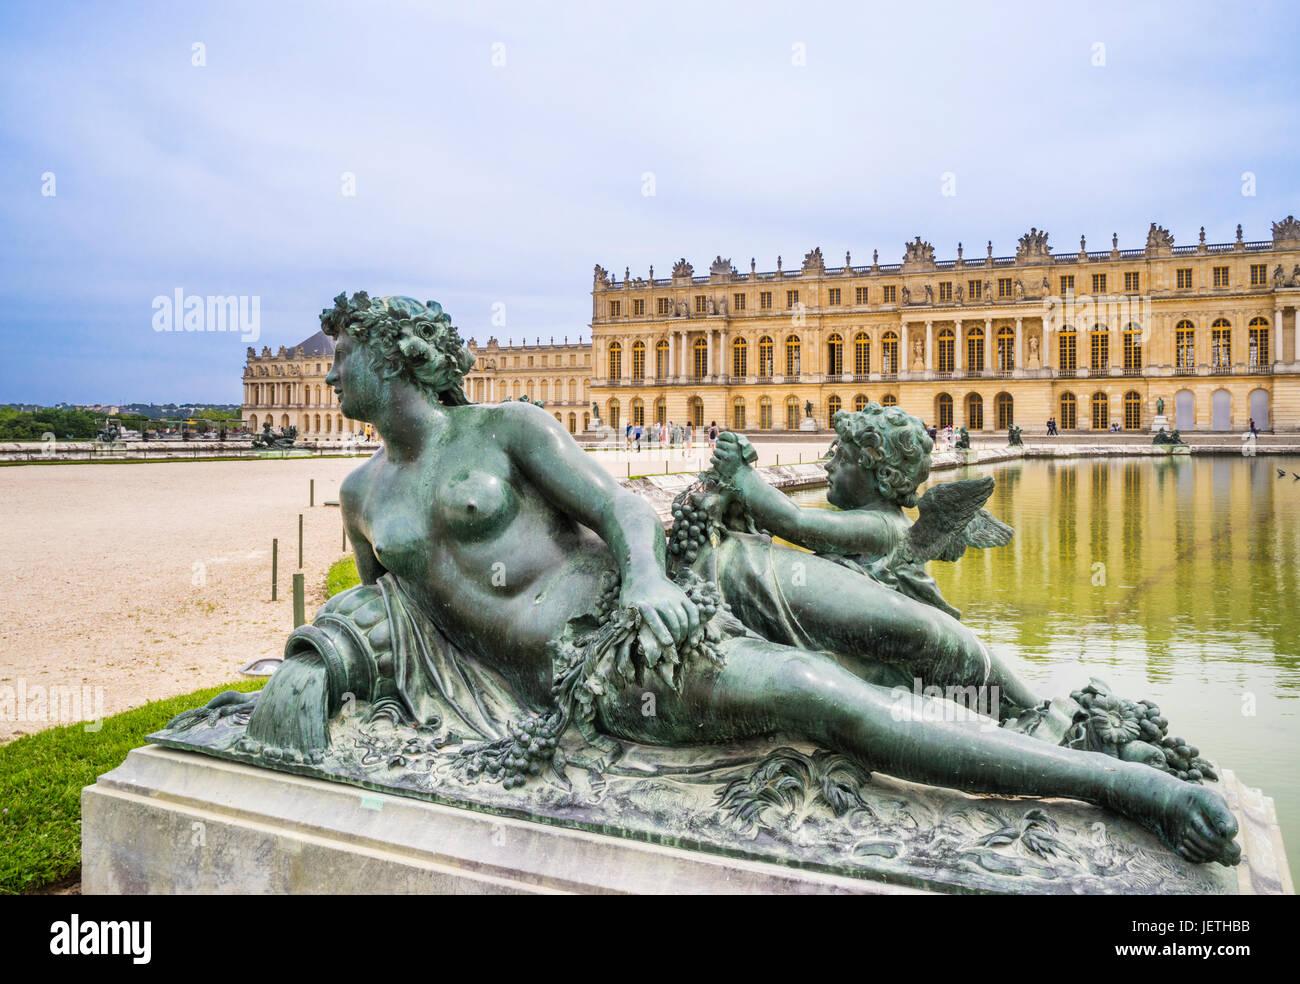 France, Ile-de-France, Palace of Versailles, Parterre d'Eau, Garden Facade of the palace and bronce sculpture - Stock Image